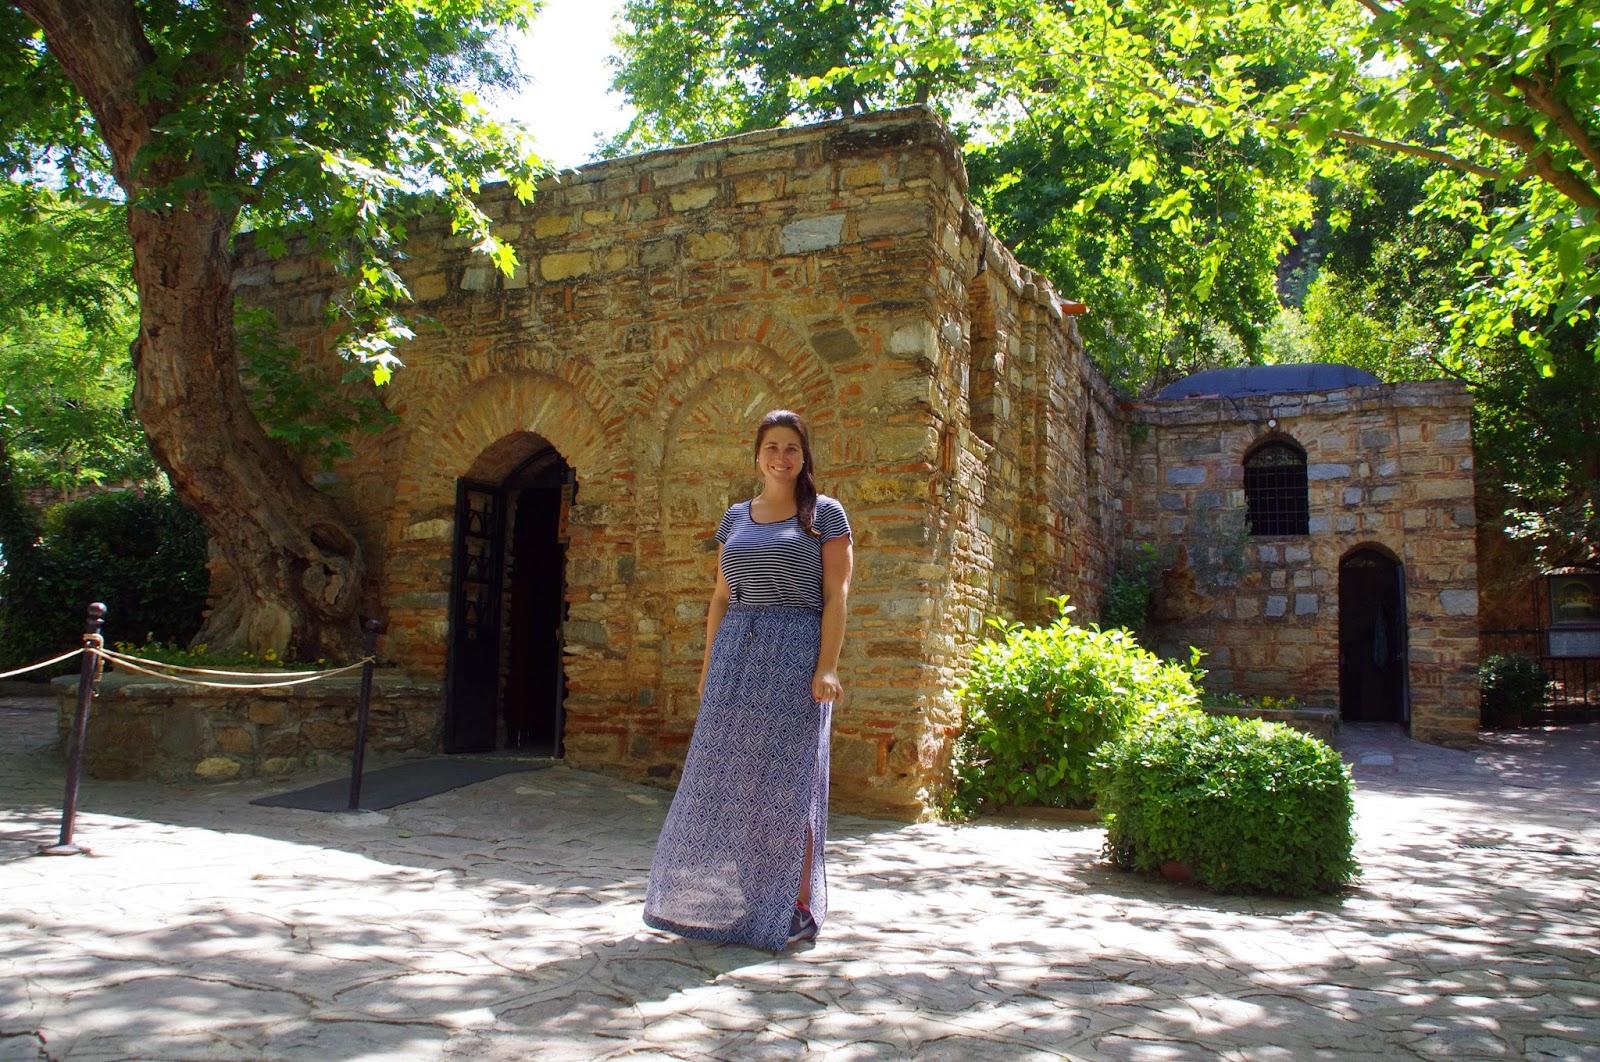 Virgin Mary's House Turkey